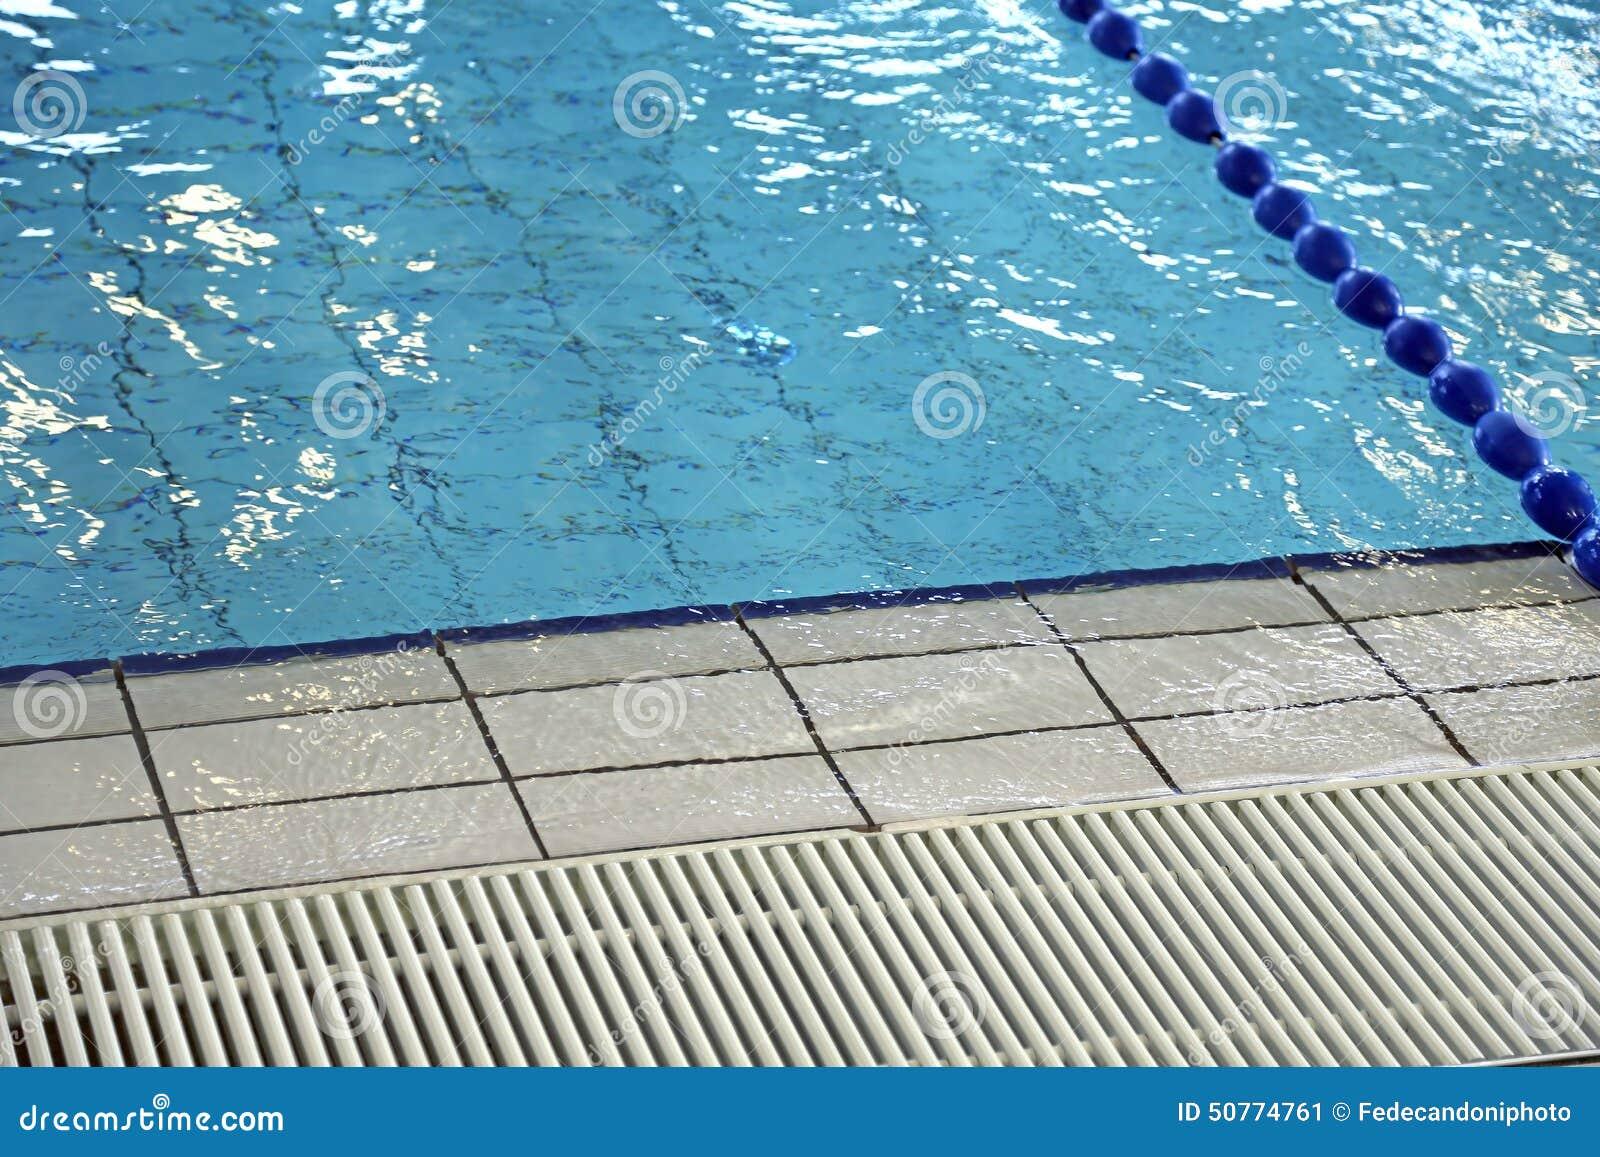 Rejilla para la circulaci n del agua en piscina foto de for Rejilla piscina